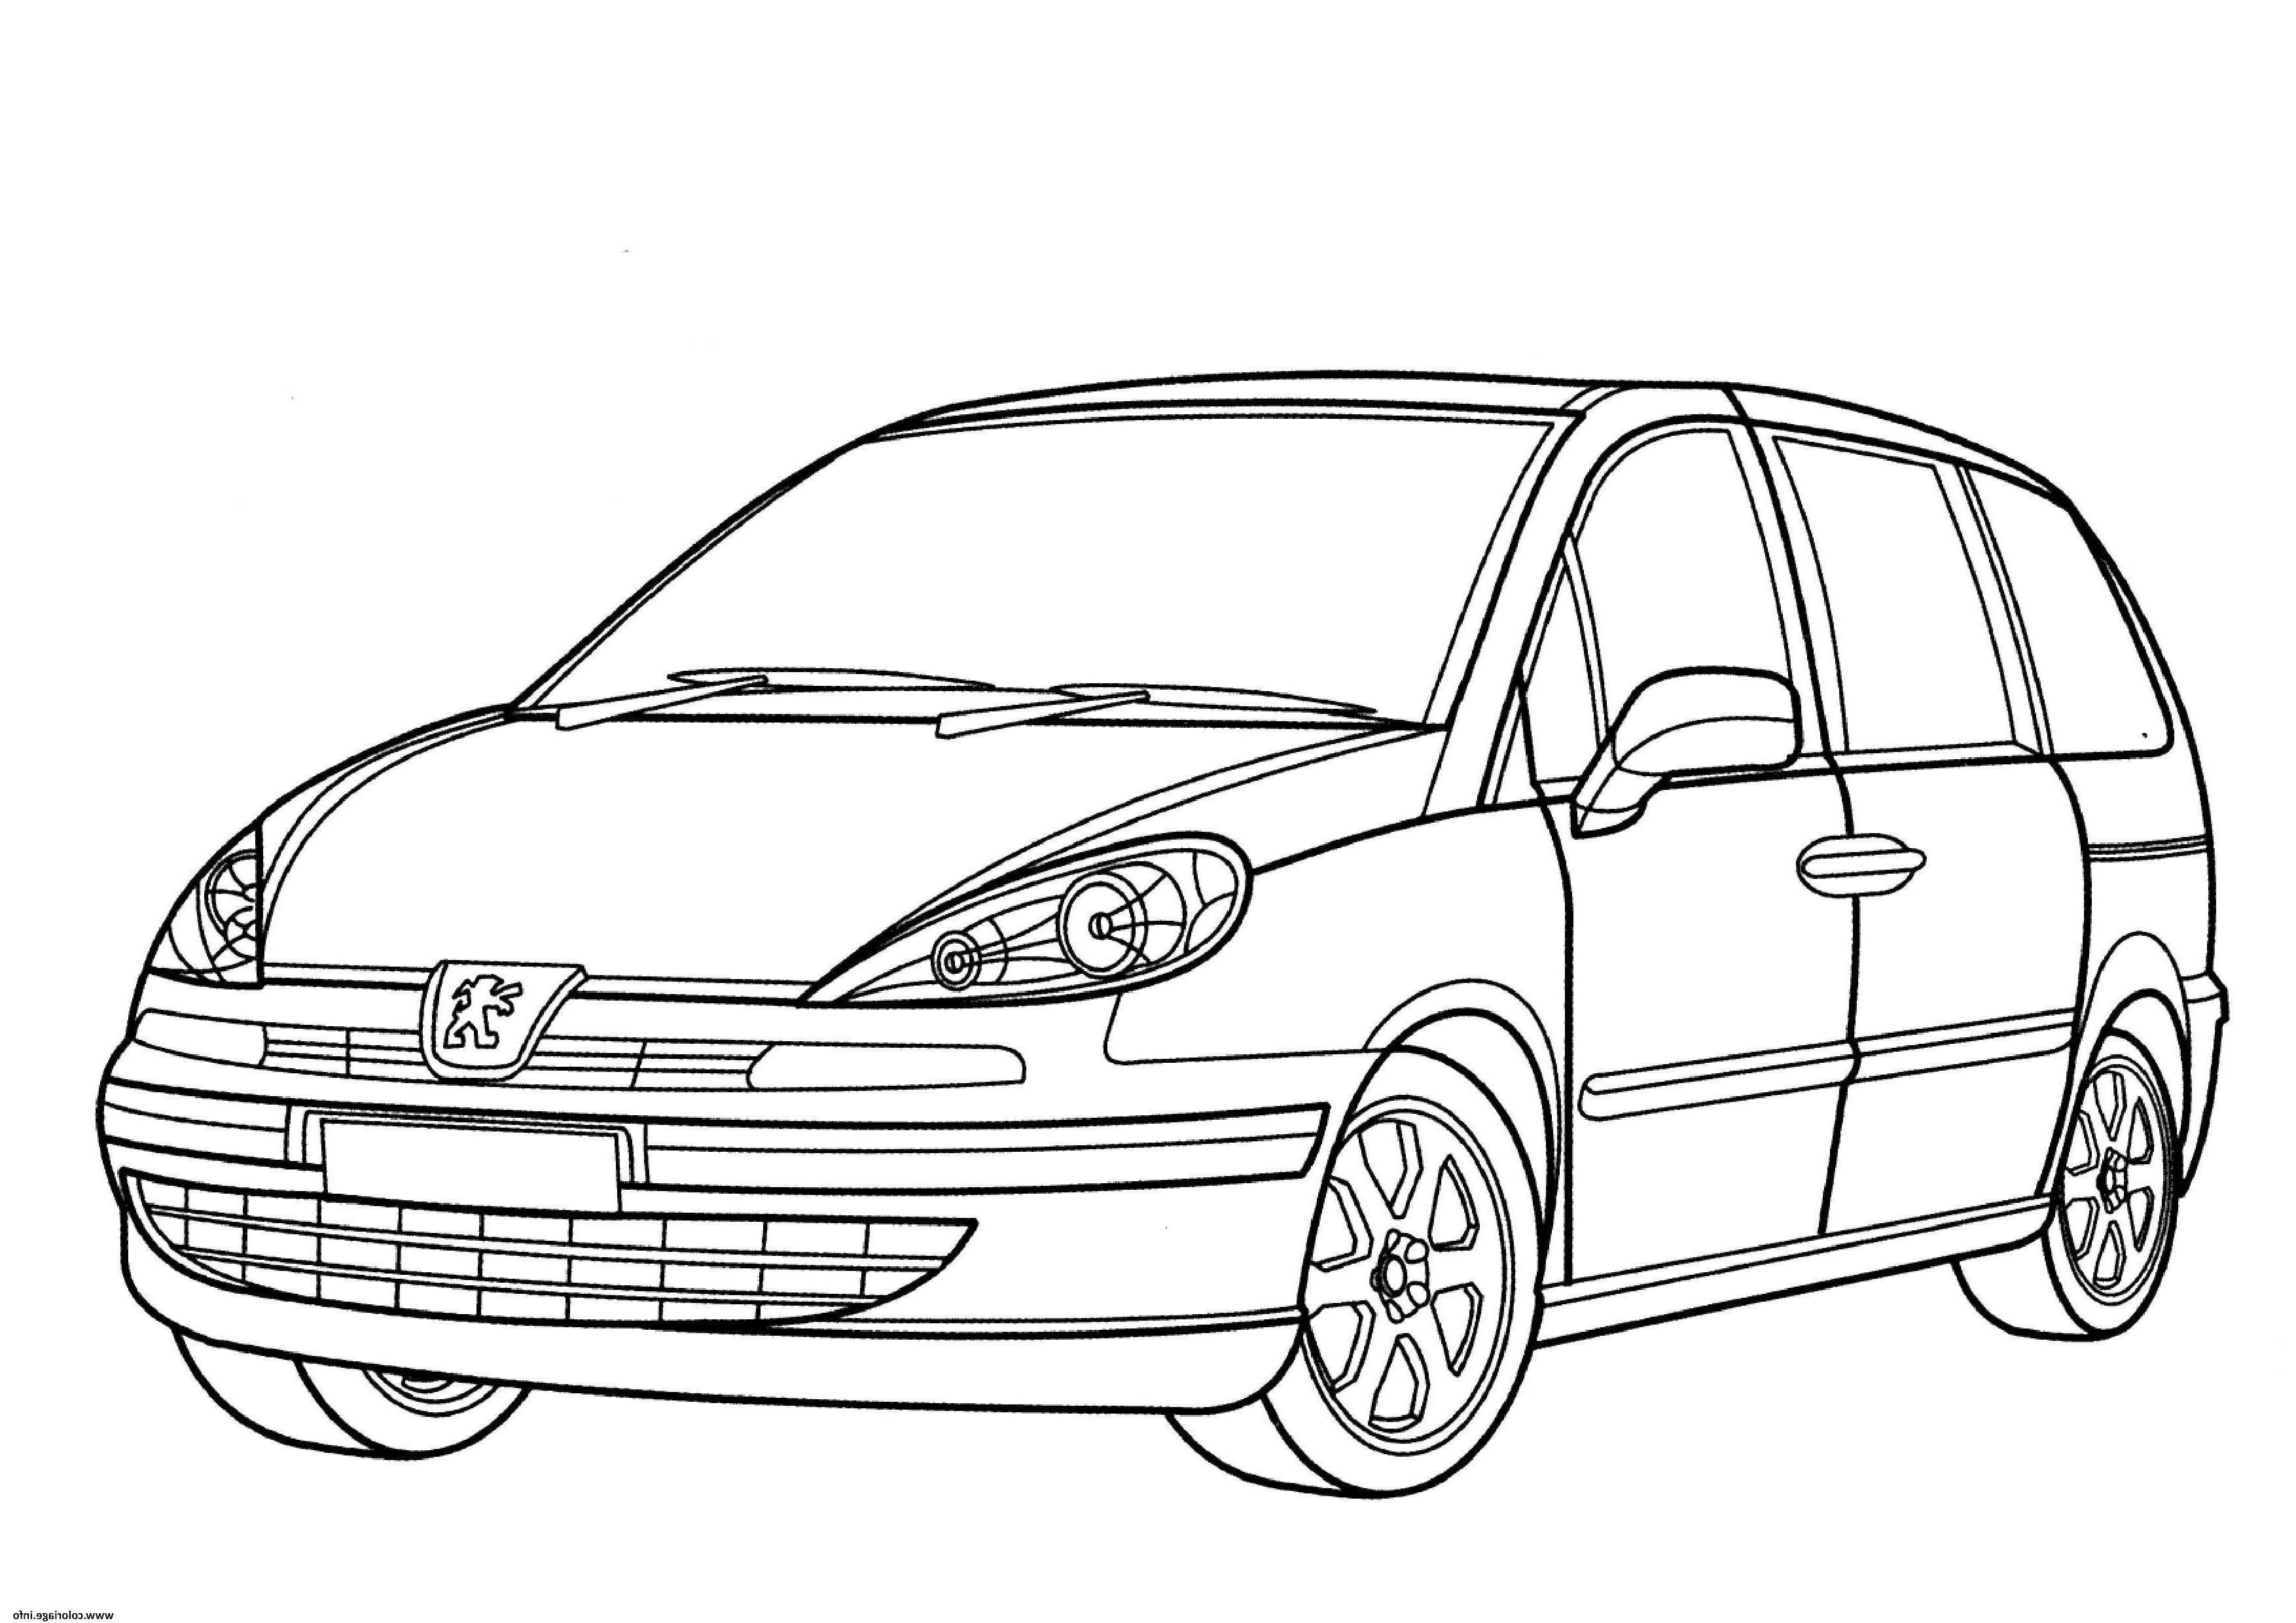 Coloriage Vehicule - Greatestcoloringbook pour Voiture Int?Rieur Coloriage